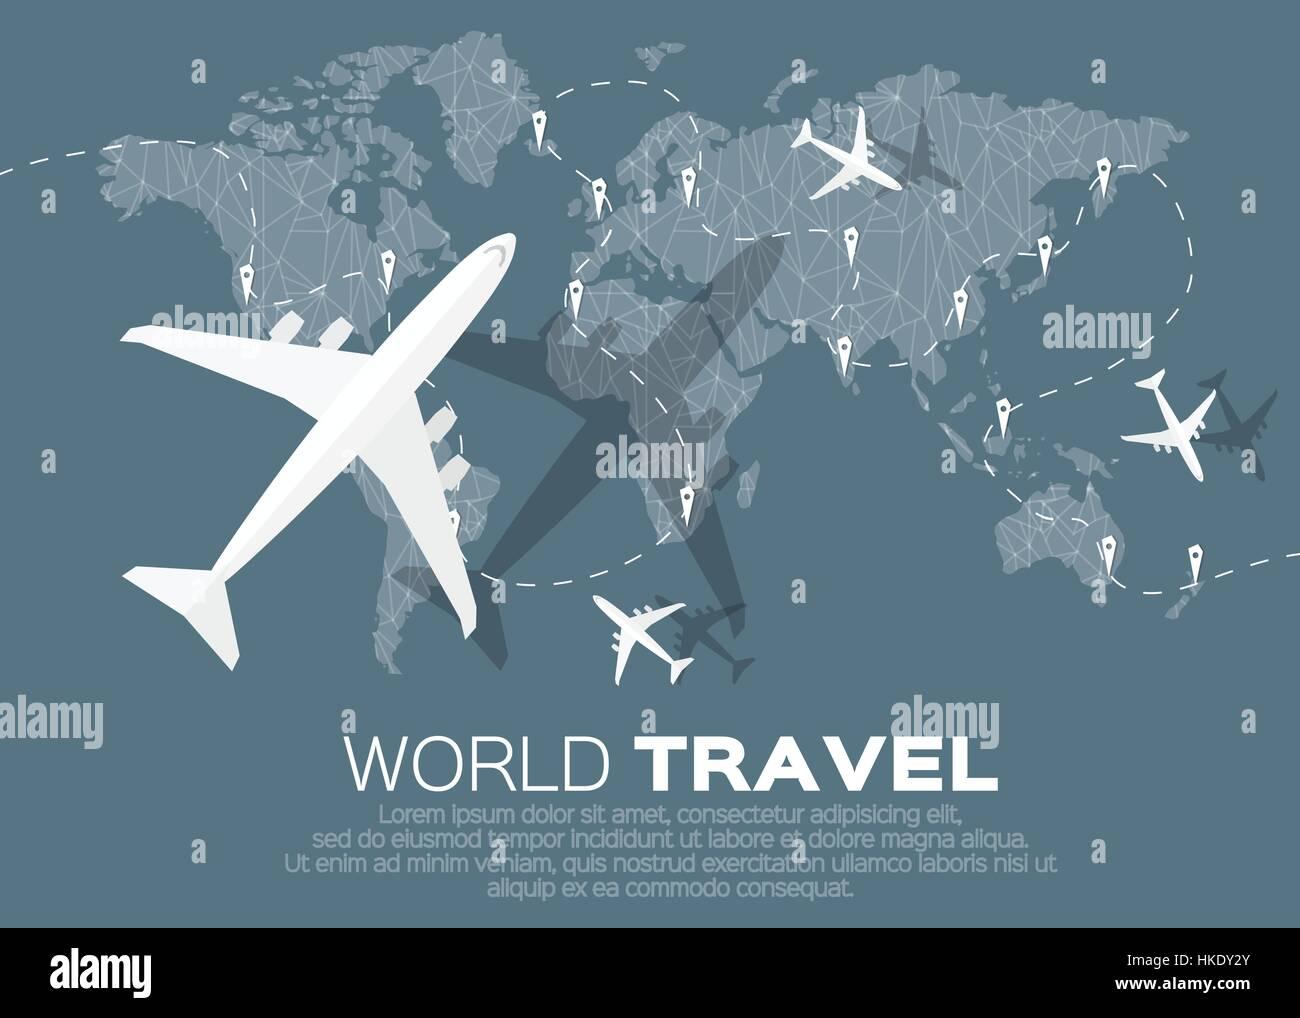 Travel world map background in polygonal style with top view stock travel world map background in polygonal style with top view airplane vector illustration design gumiabroncs Images